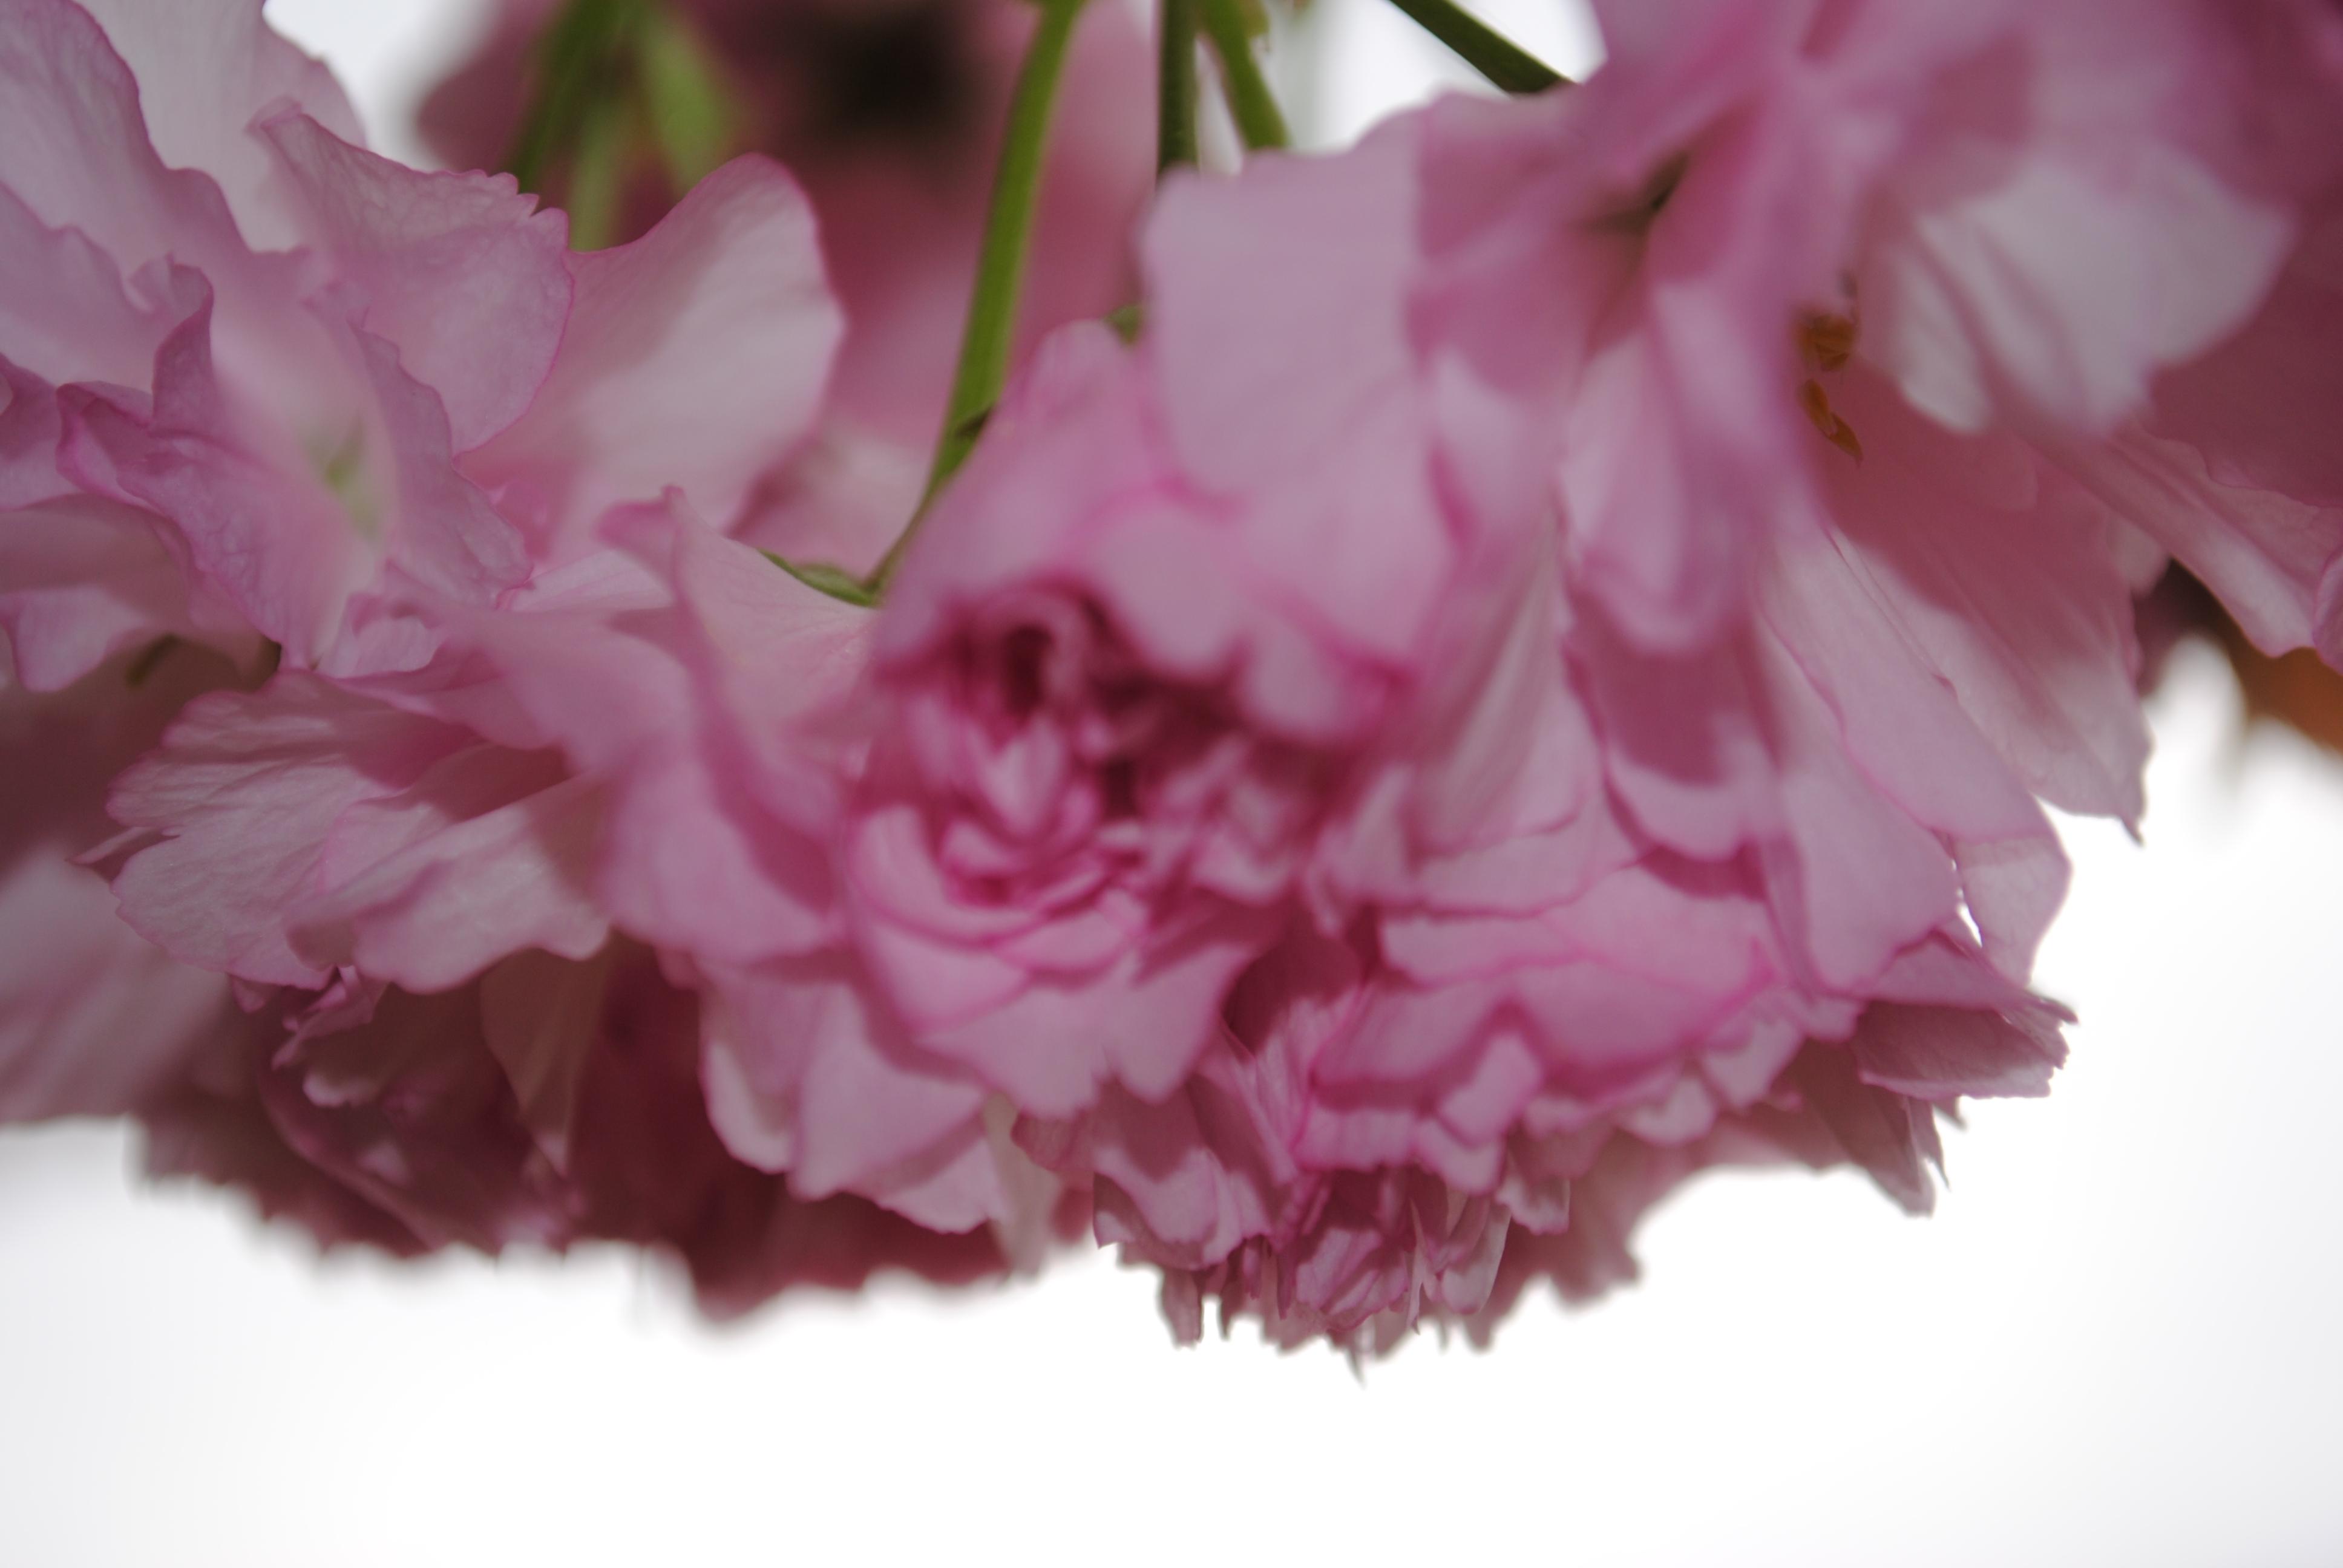 Filelight pink flowering tree blooms closeupg wikimedia commons filelight pink flowering tree blooms closeupg mightylinksfo